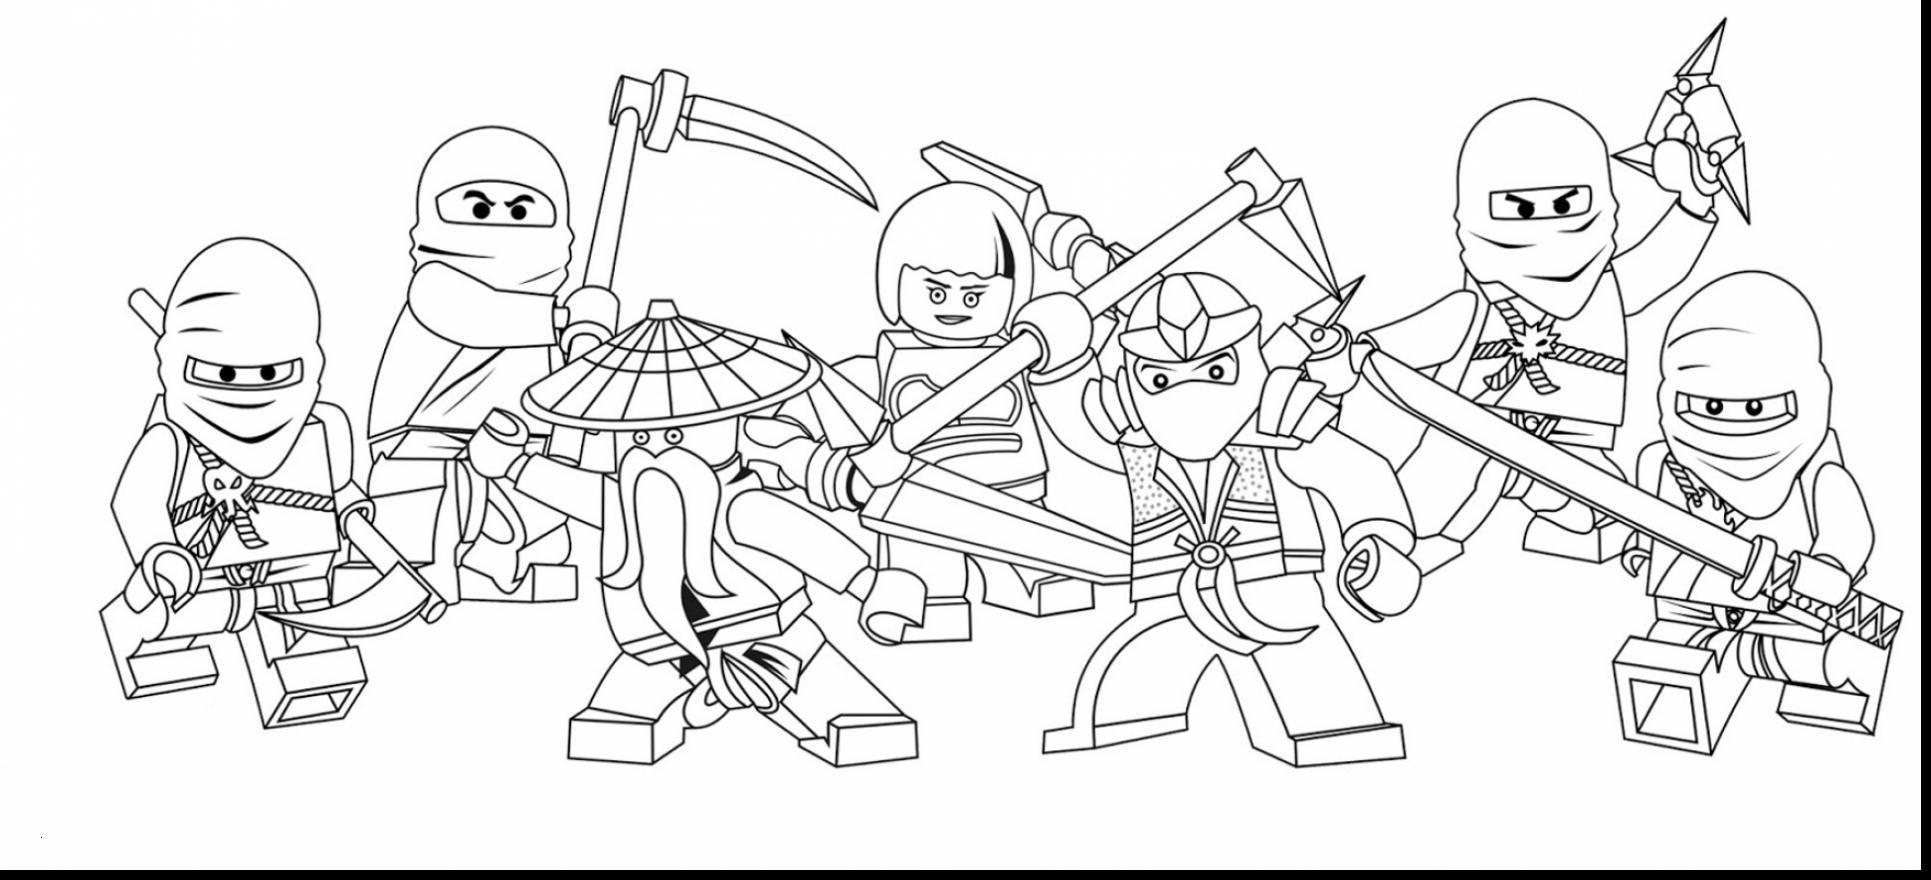 Lego Ninjago Bilder Zum Ausdrucken Neu Malvorlagen Nemo Kostenlos Best Kostenlose Malvorlagen Zum Fotos